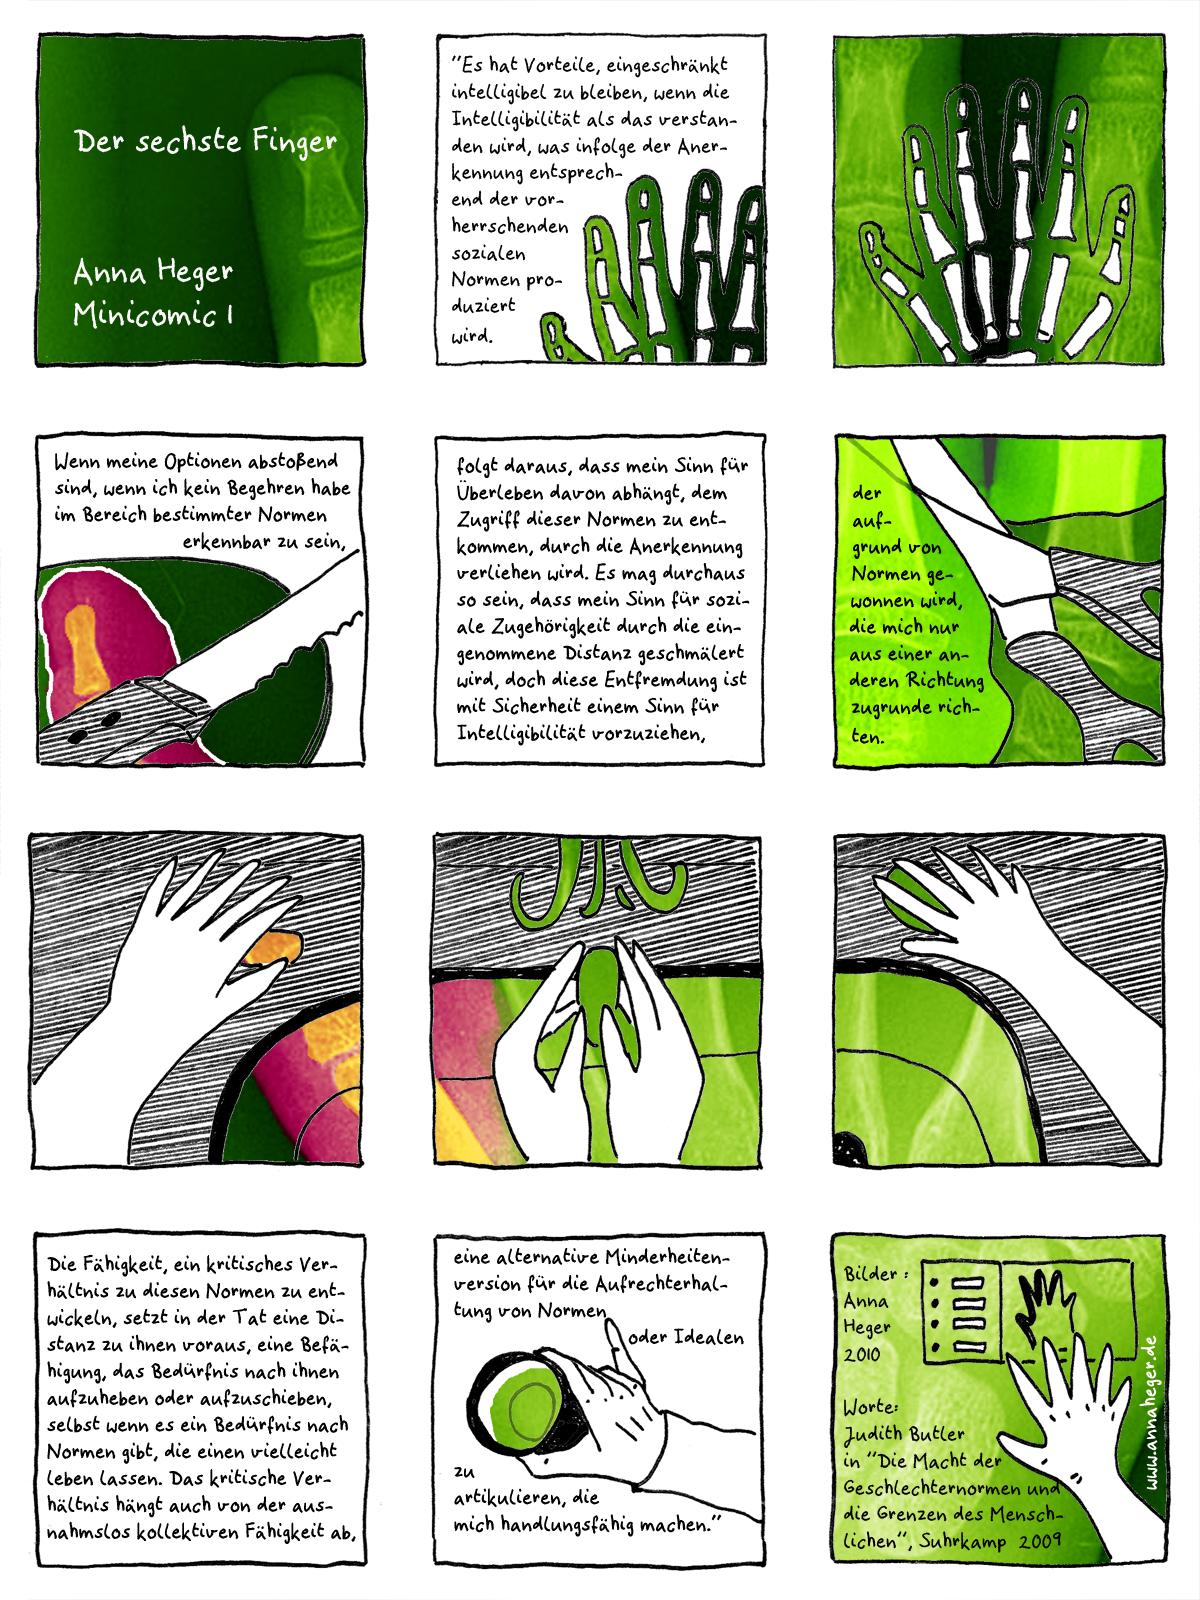 Minicomic 01 : Der sechste Finger, visuelles Comic, das ganze Comic wird im folgenden in reinen Text transkribiert